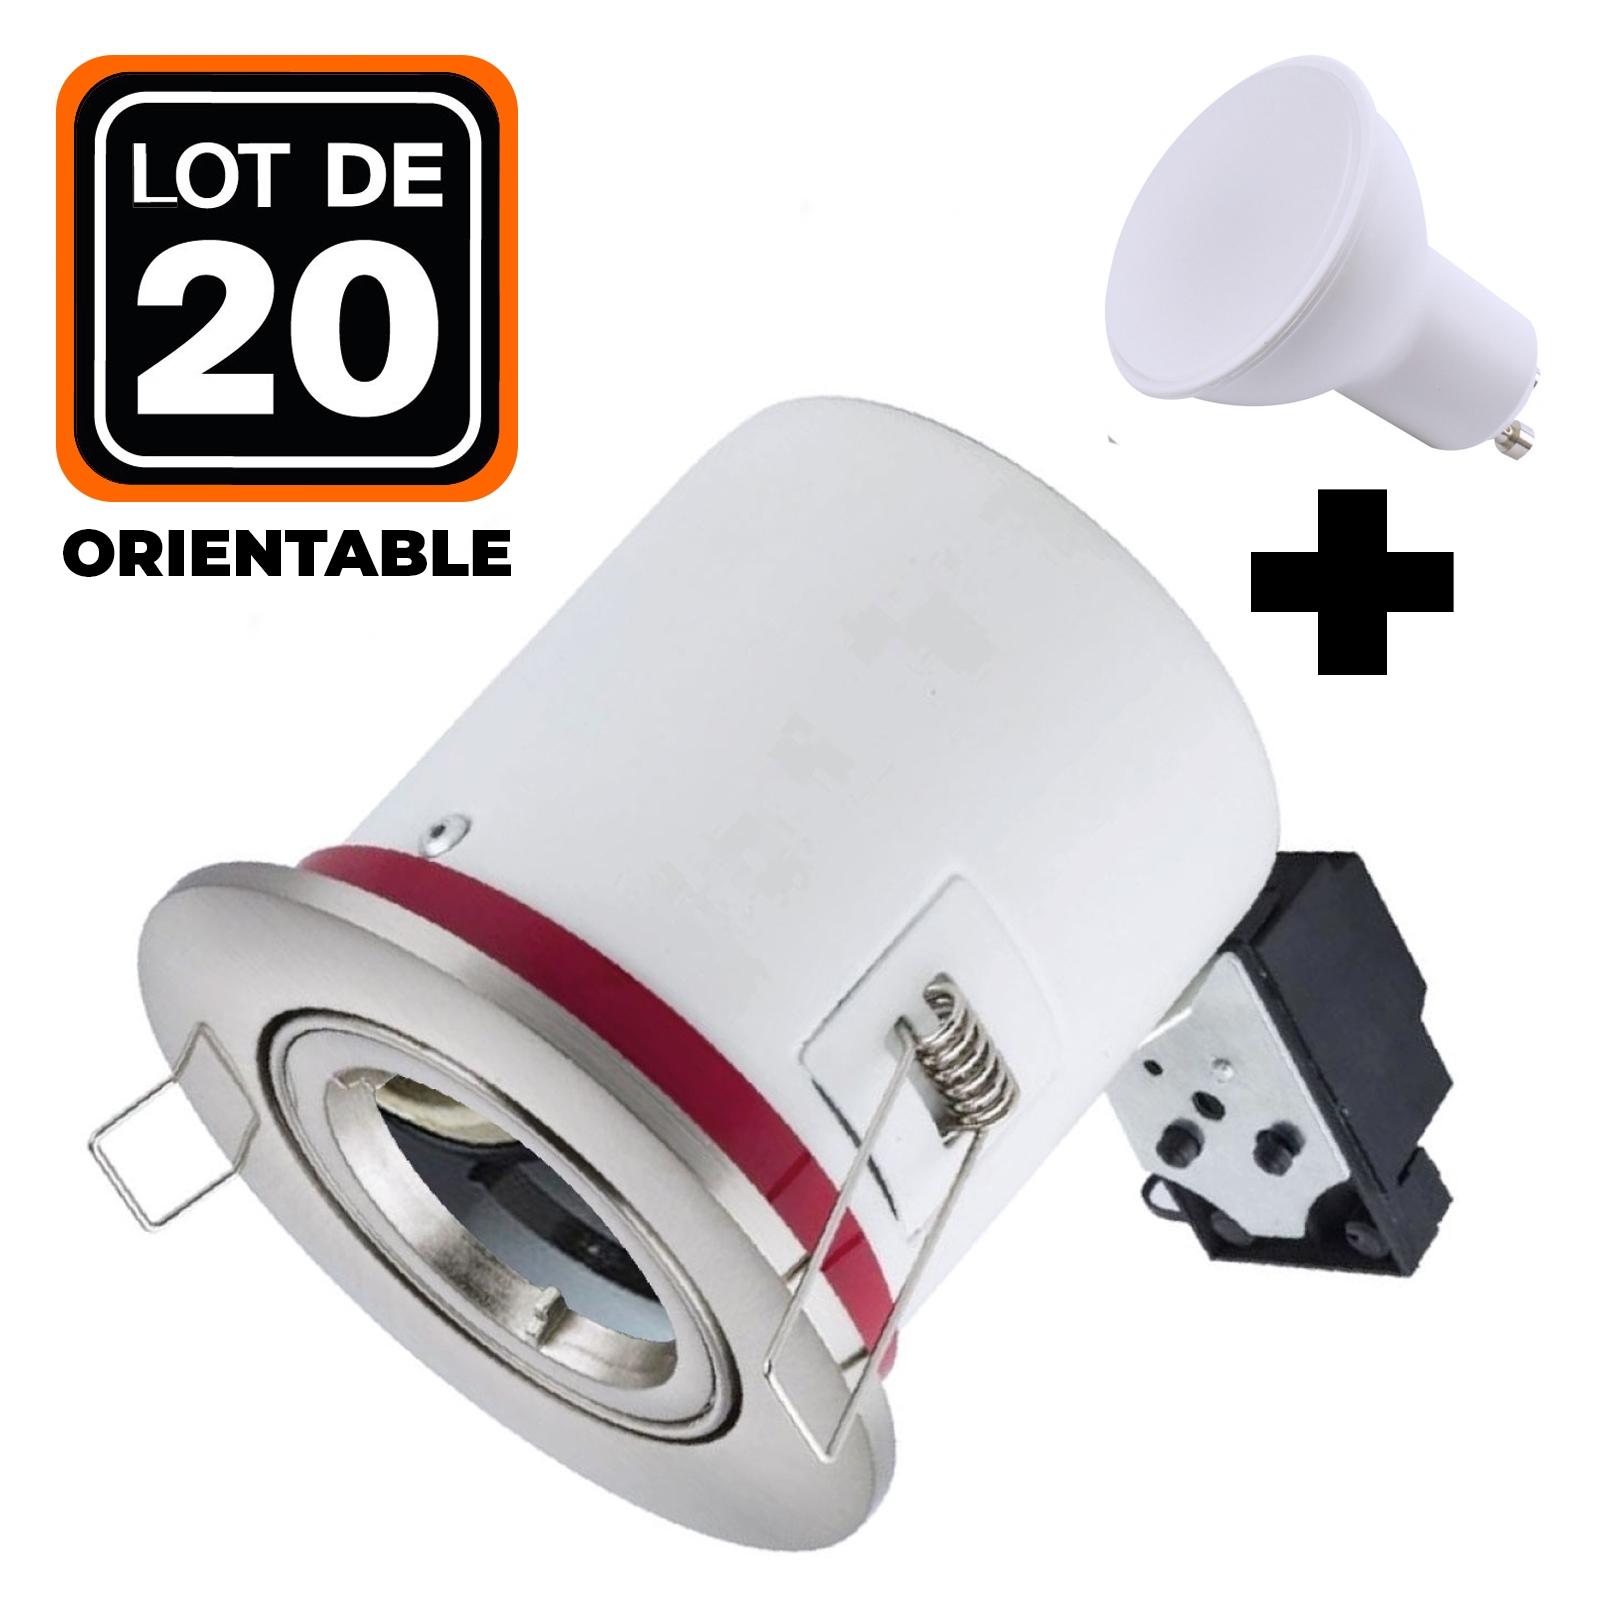 Lot 20 Supports Spots BBC INOX + Ampoule GU10 7W Blanc Chaud + Douille